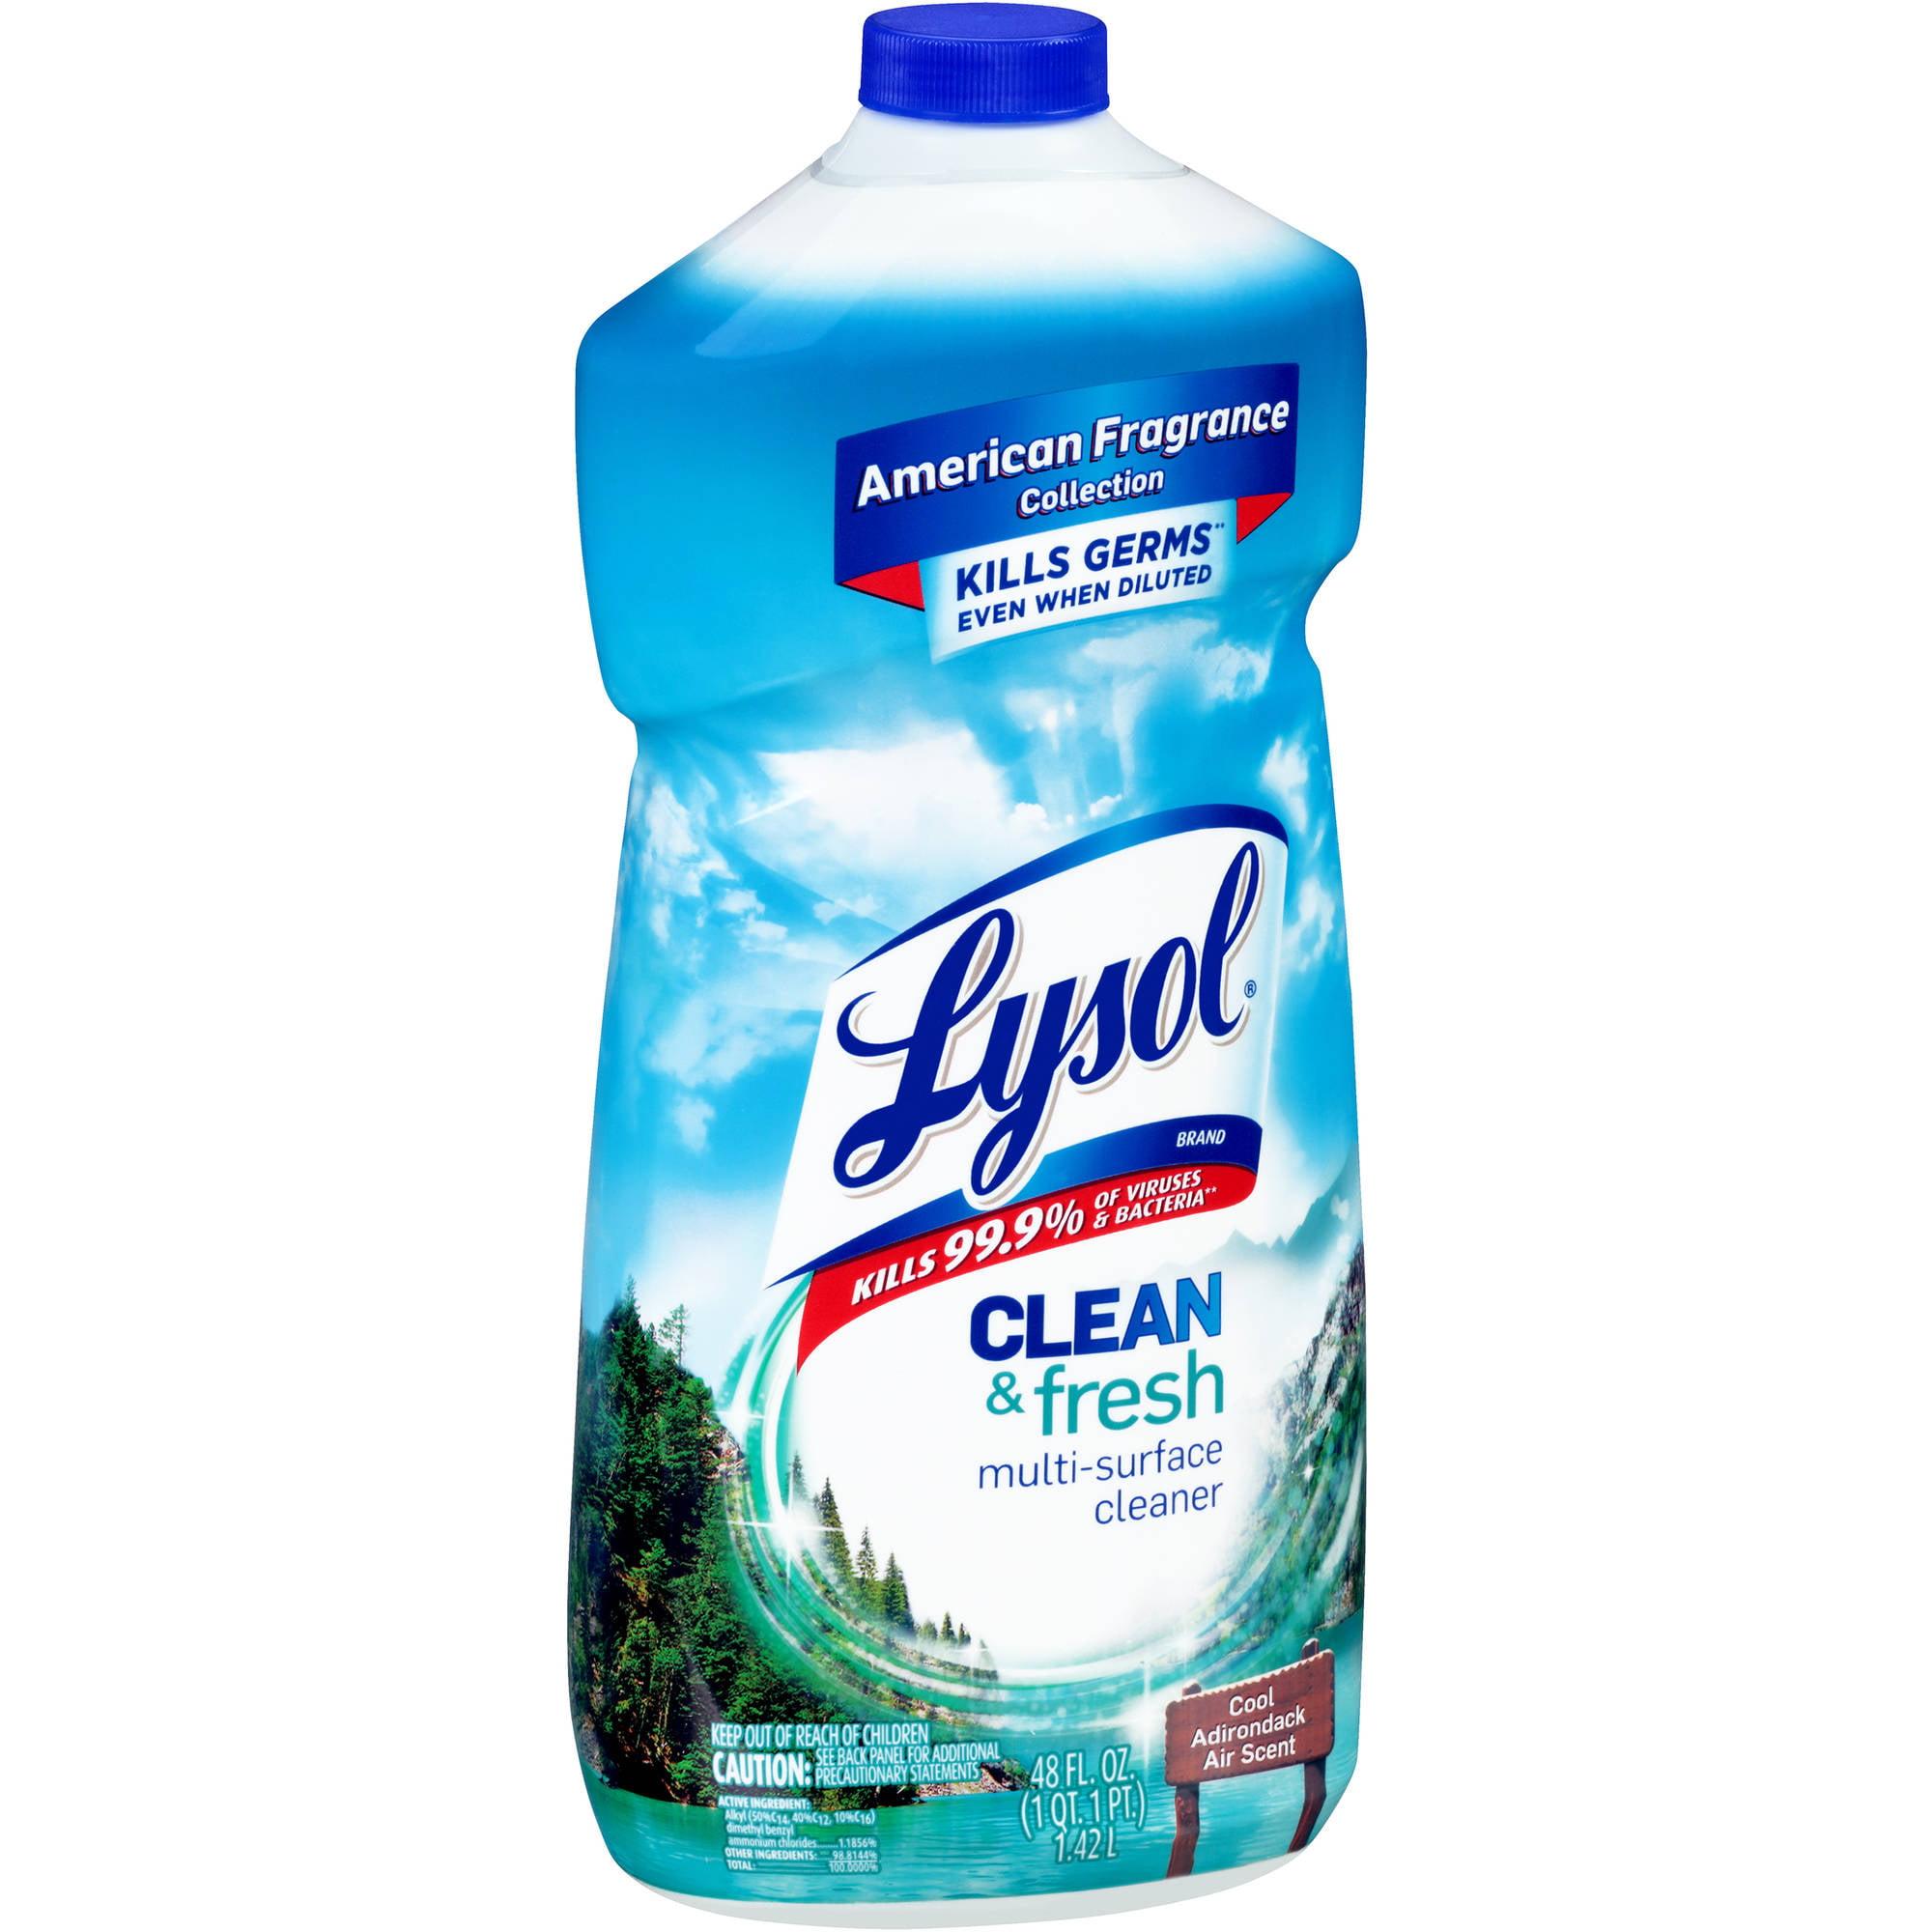 Lysol Clean & Fresh Multi-Surface Cleaner, 48 fl oz